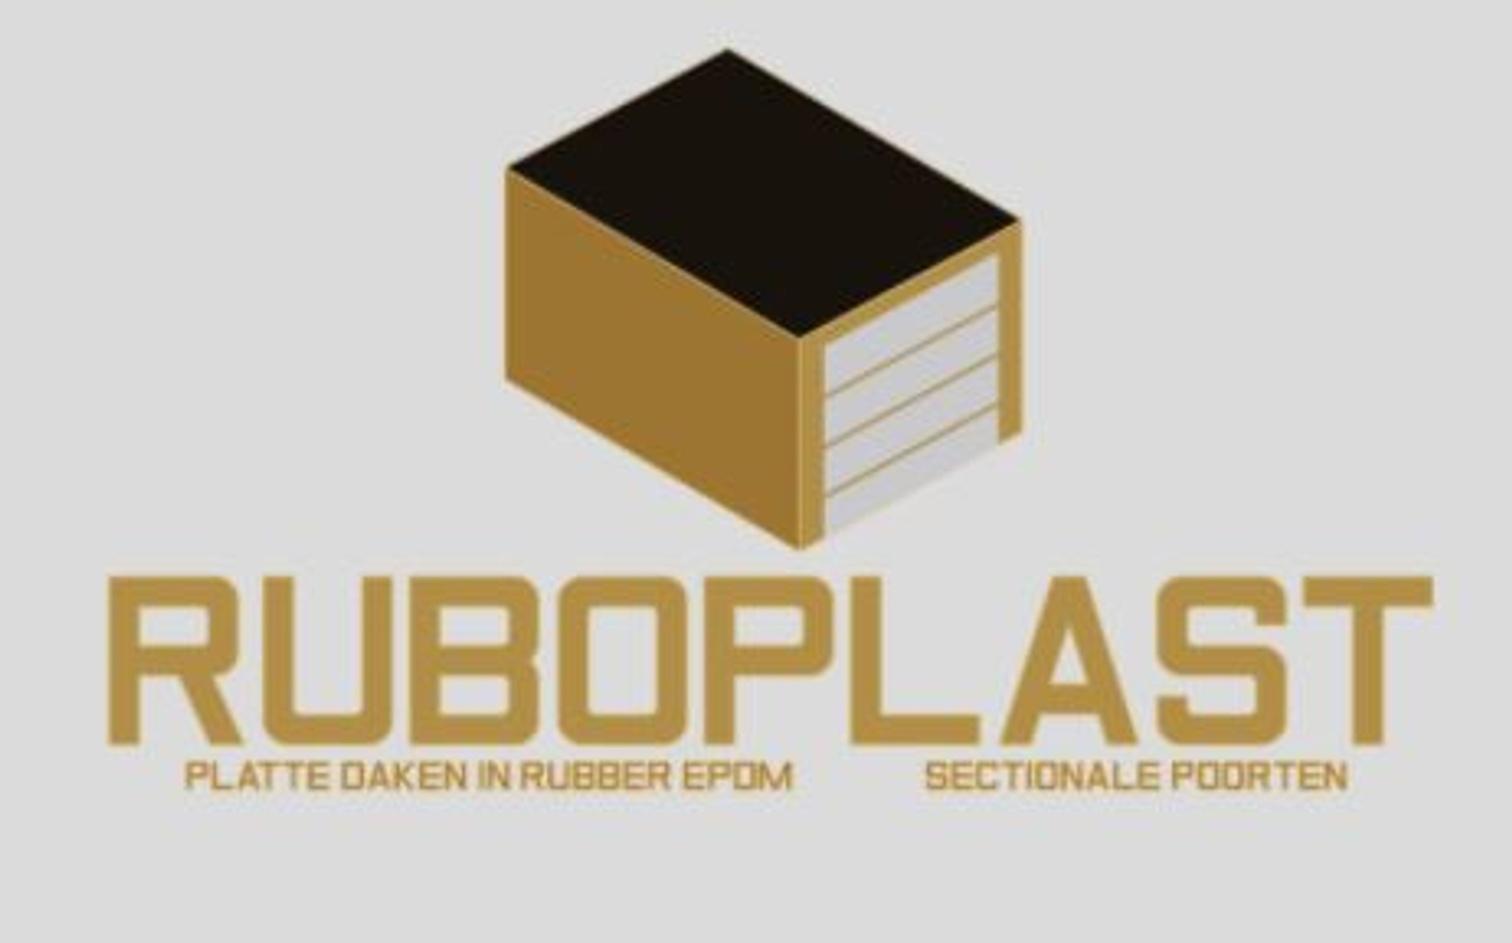 Ruboplast logo